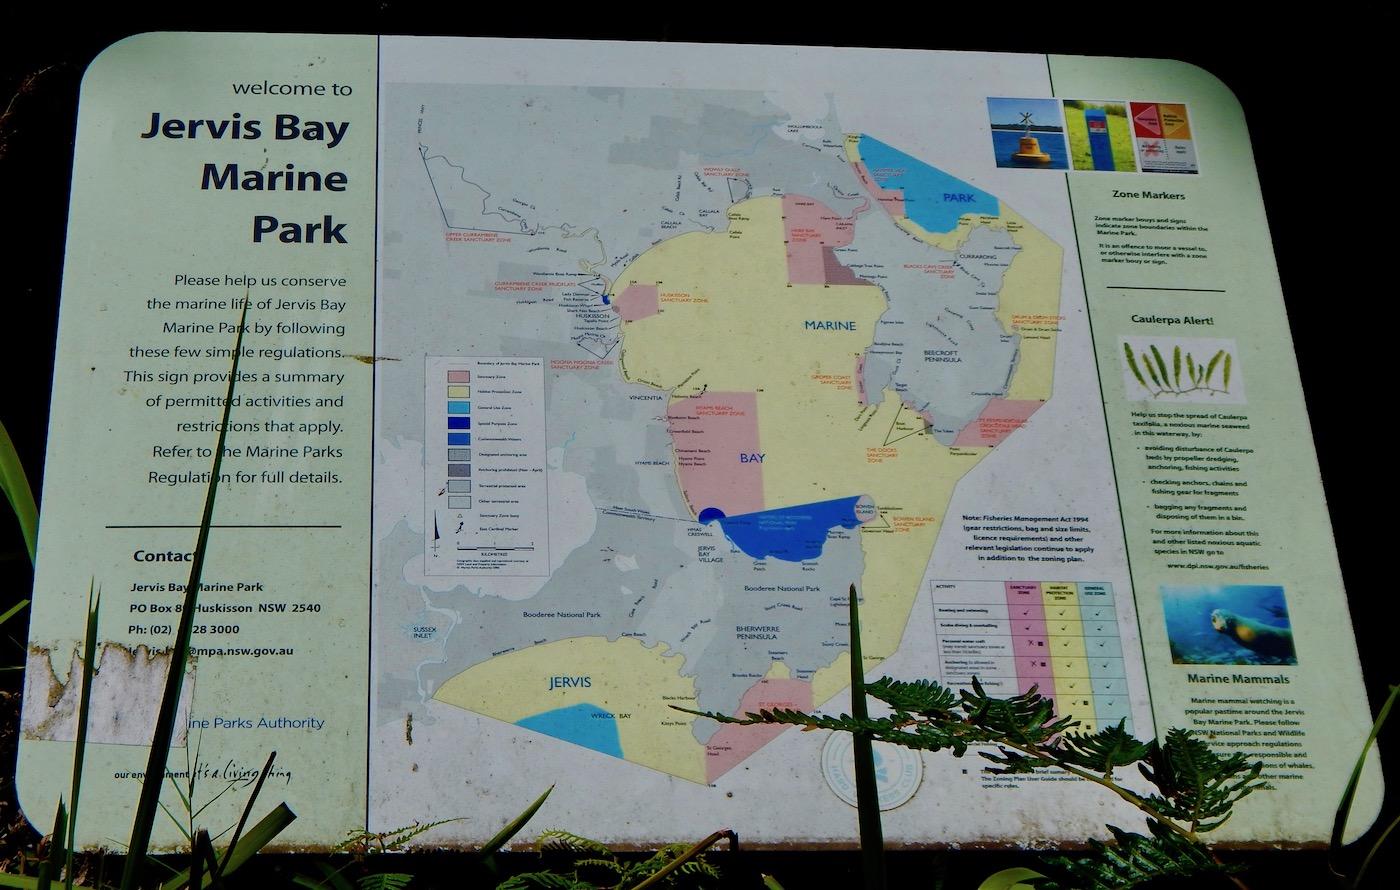 Jervis Bay marine park Map